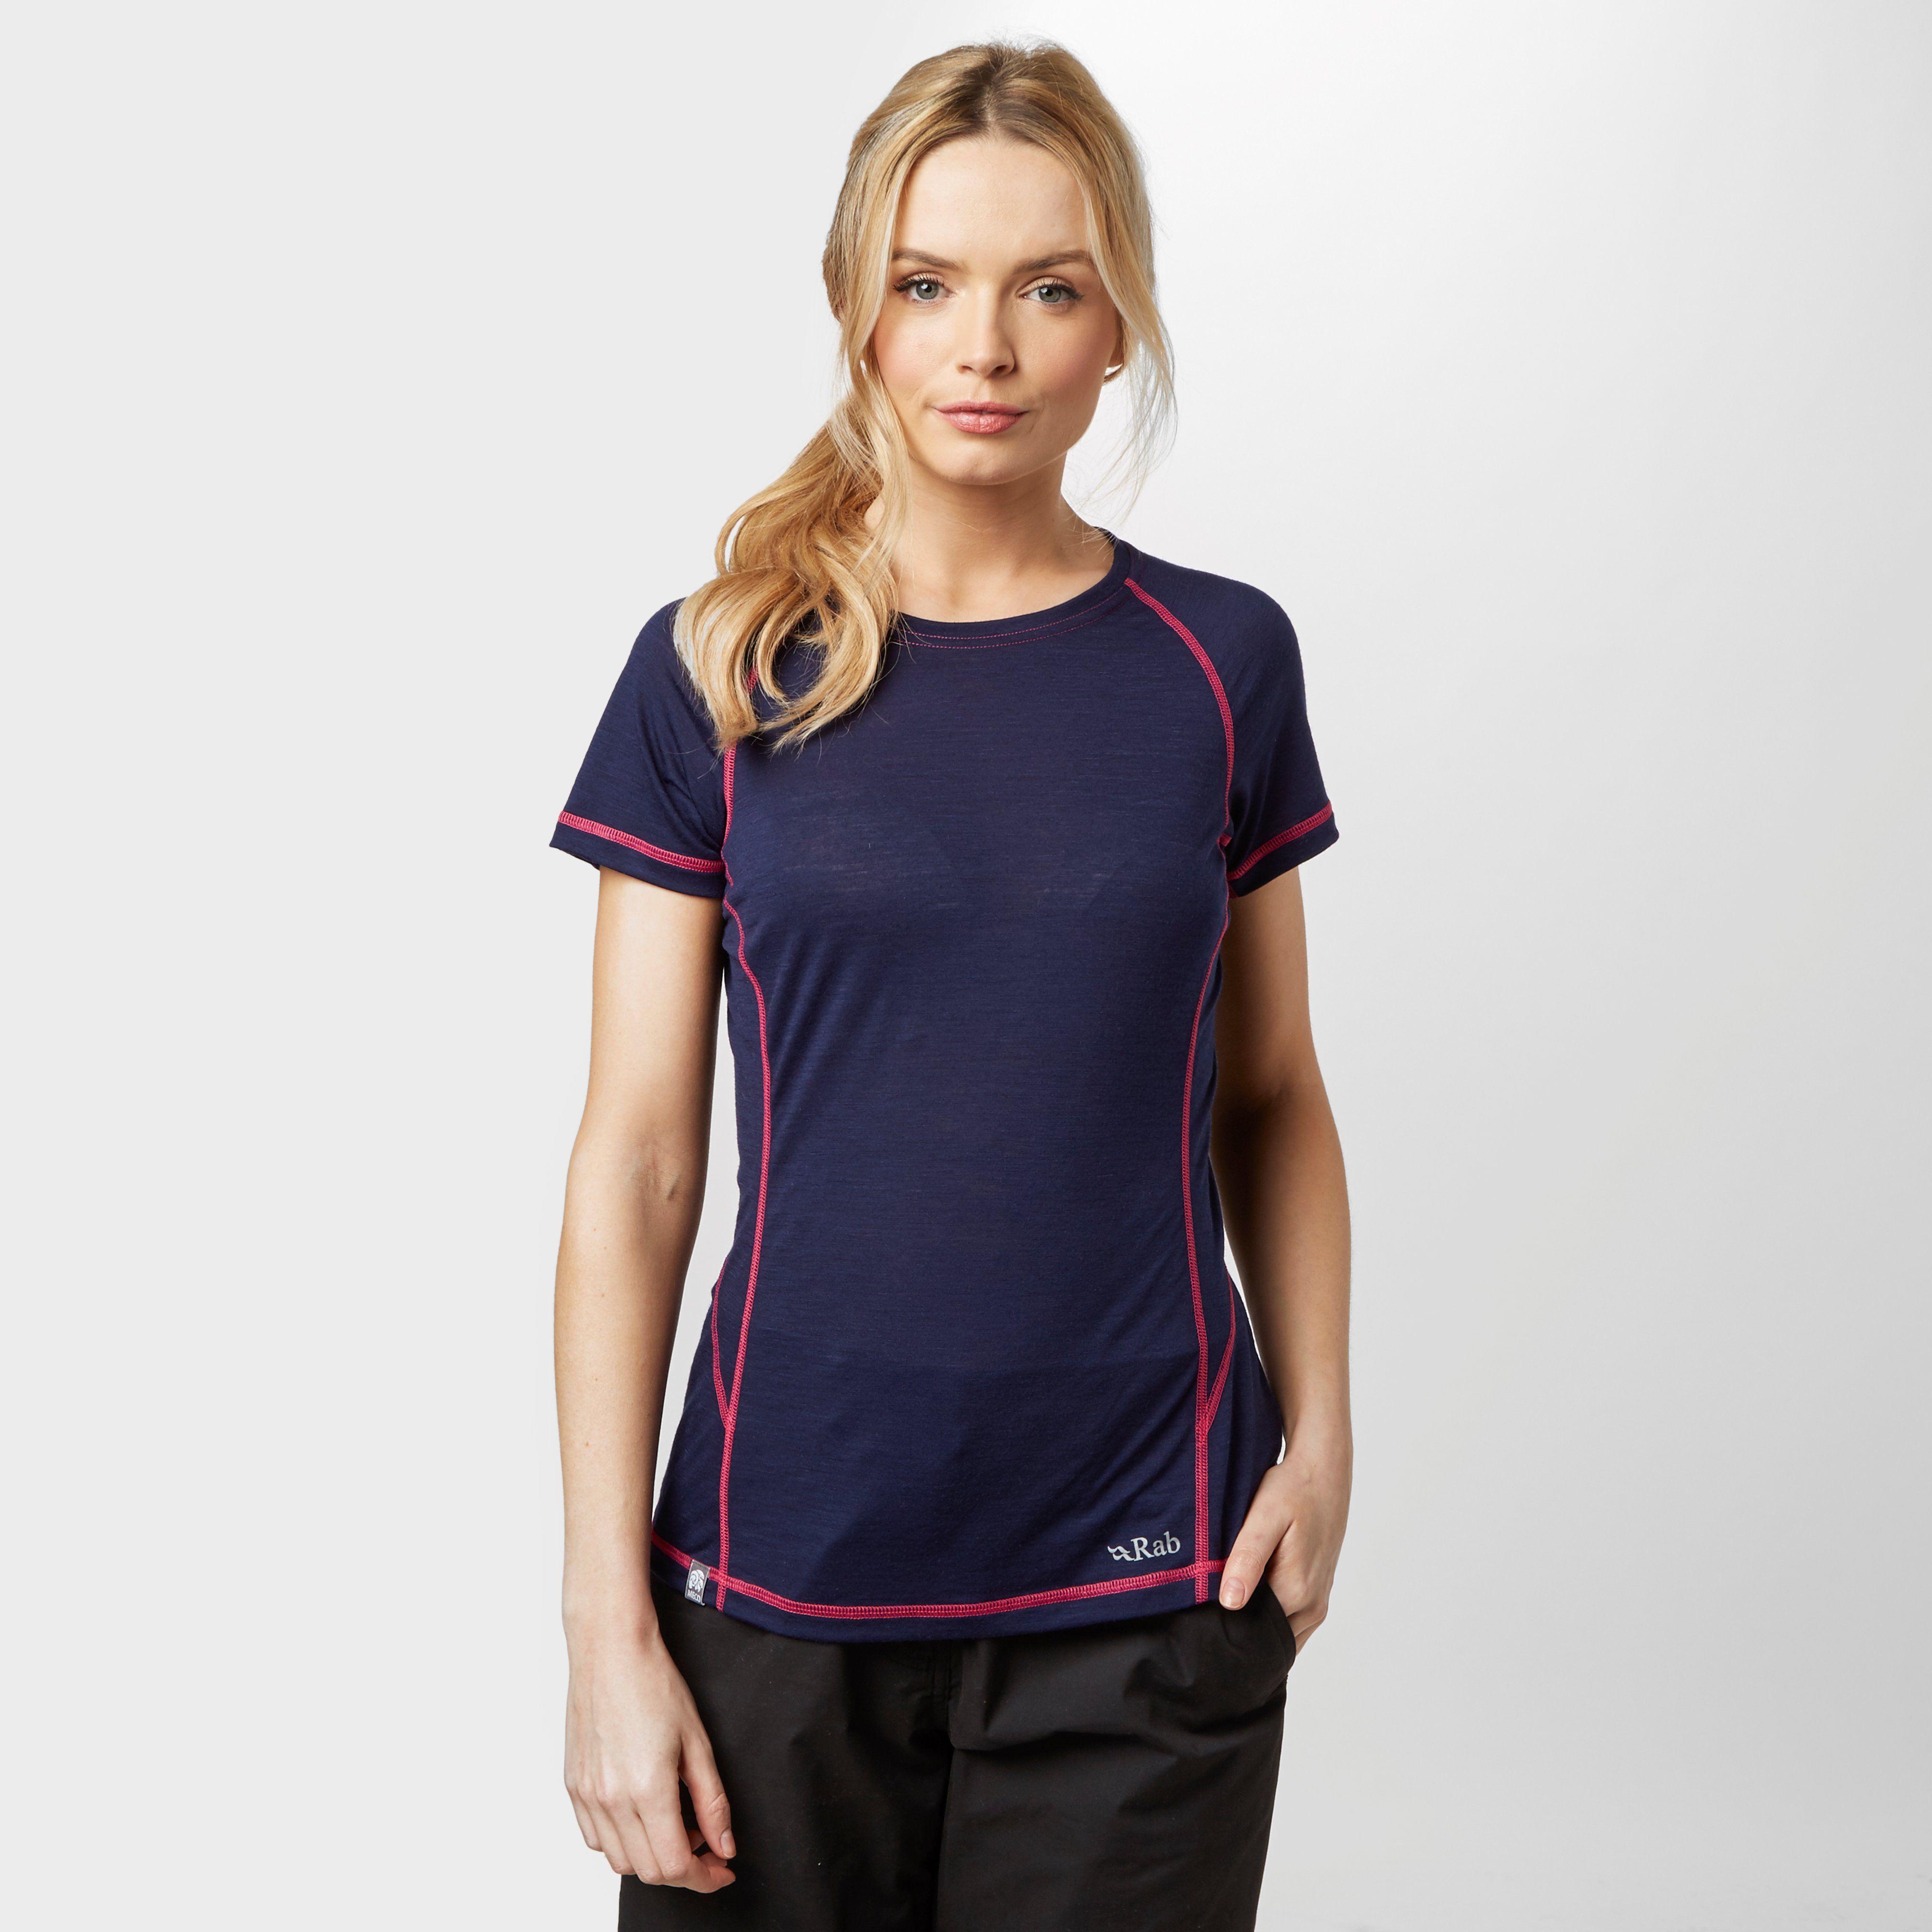 RAB Women's Meco™ 120 Short Sleeve Tee